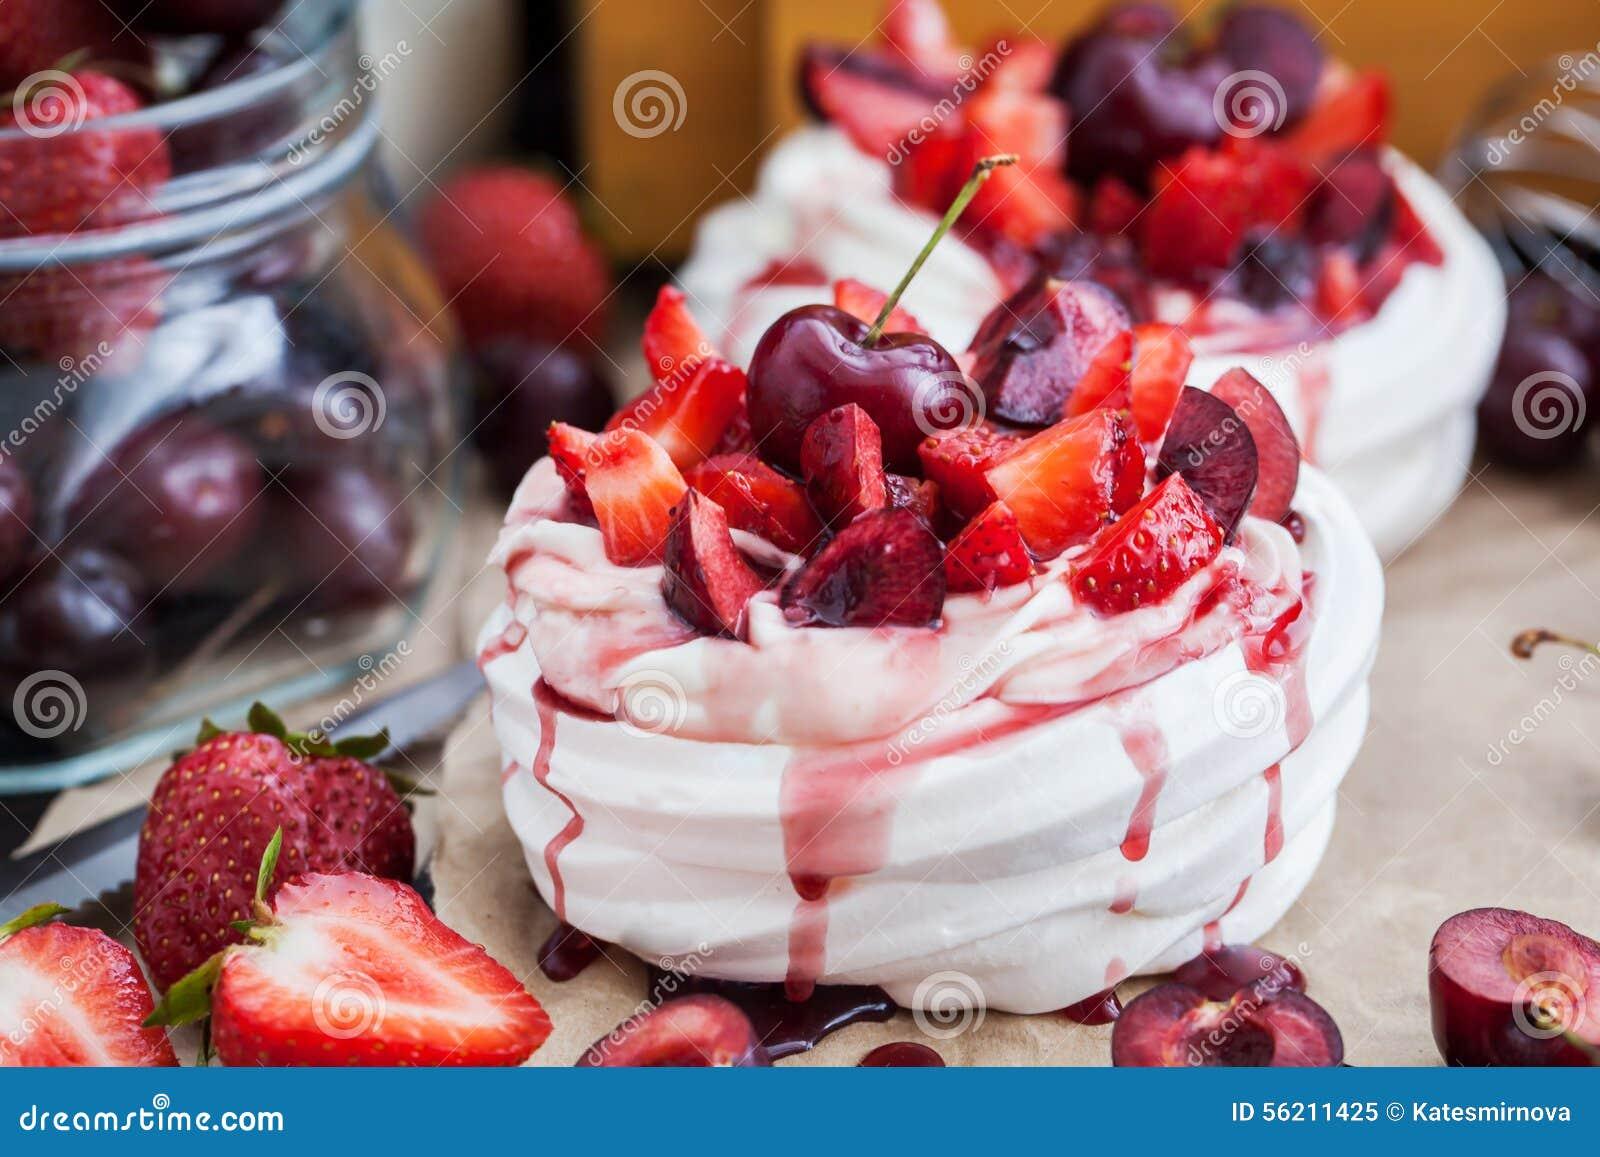 Pavlova Meringue Cake With Fresh Strawberry And Cherry Stock Image